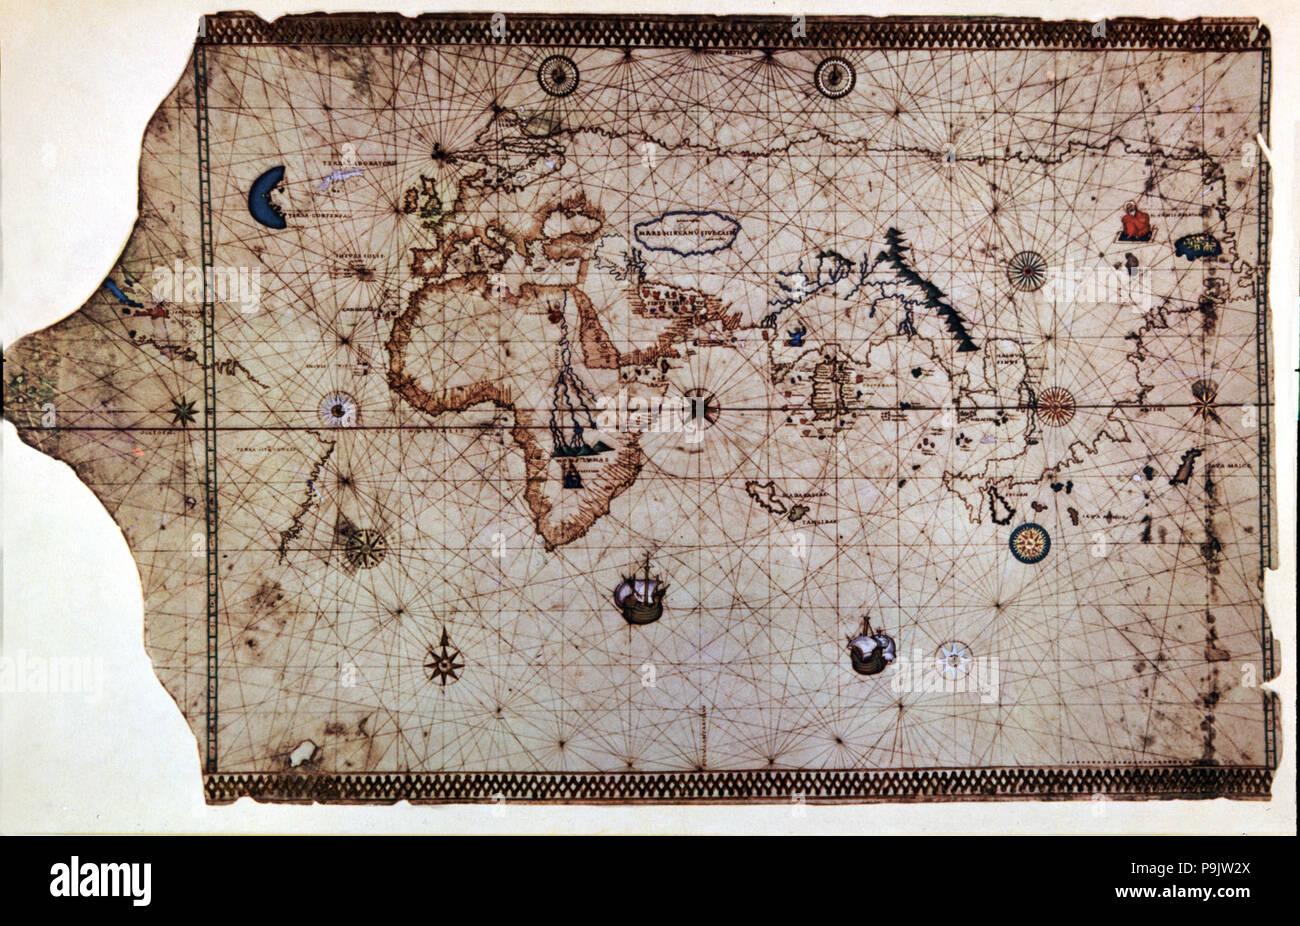 Nautical chart called 'King-Hamy', 1502, attributed to Amerigo Vespucci. Stock Photo